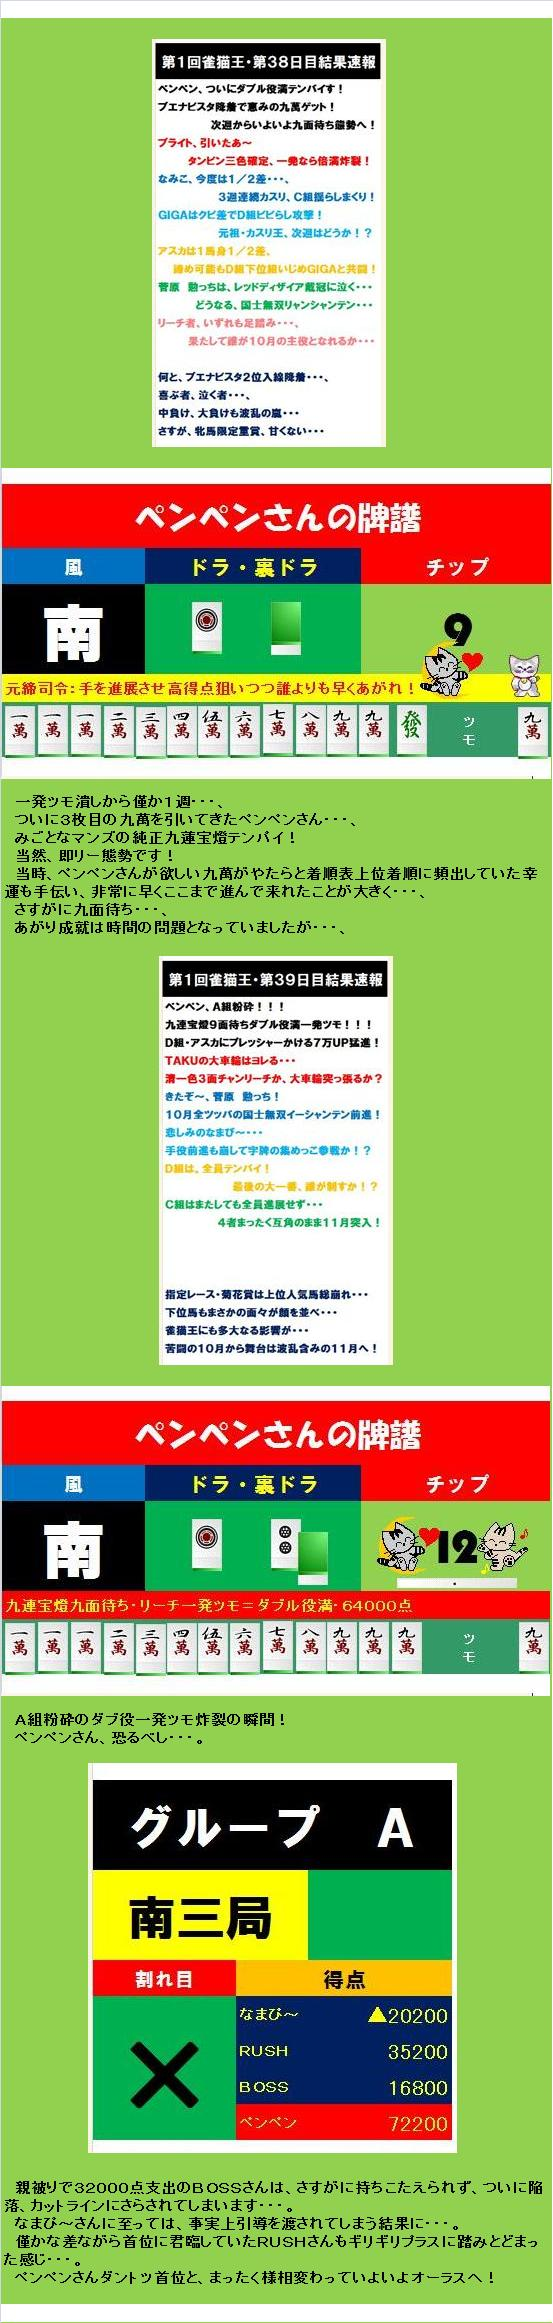 20100226・A組回顧19.jpg